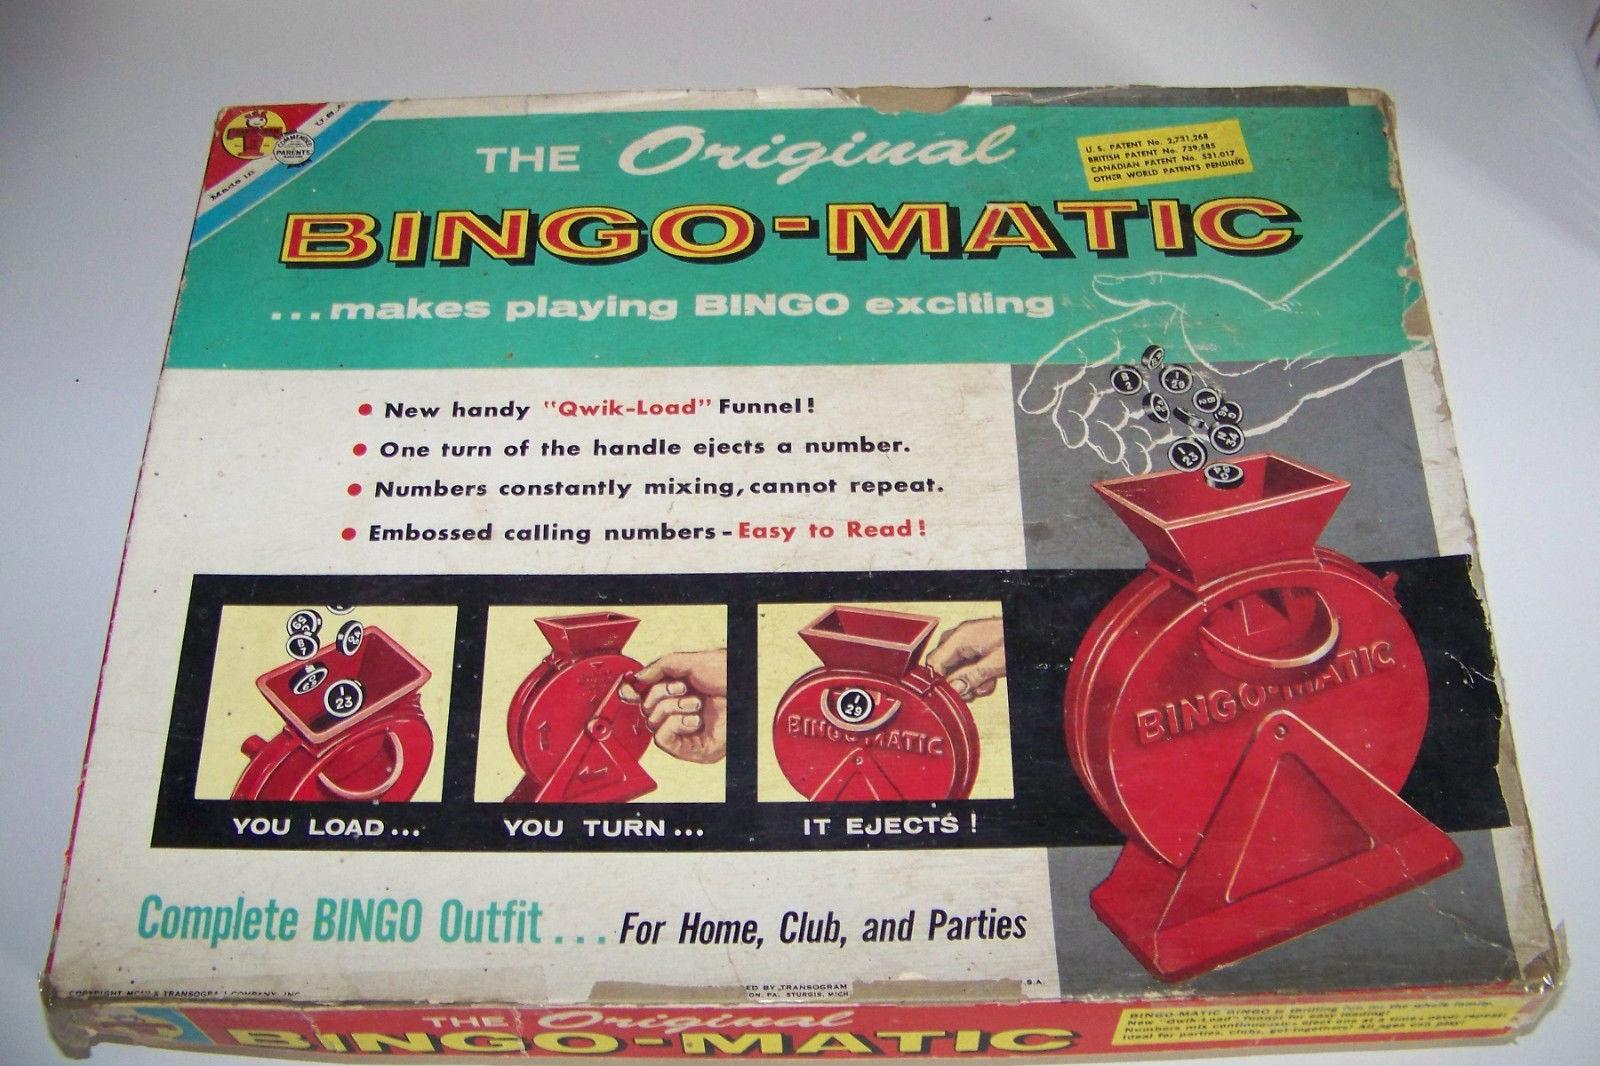 Vintage Bingo-Matic Transogram Game in Box 5984